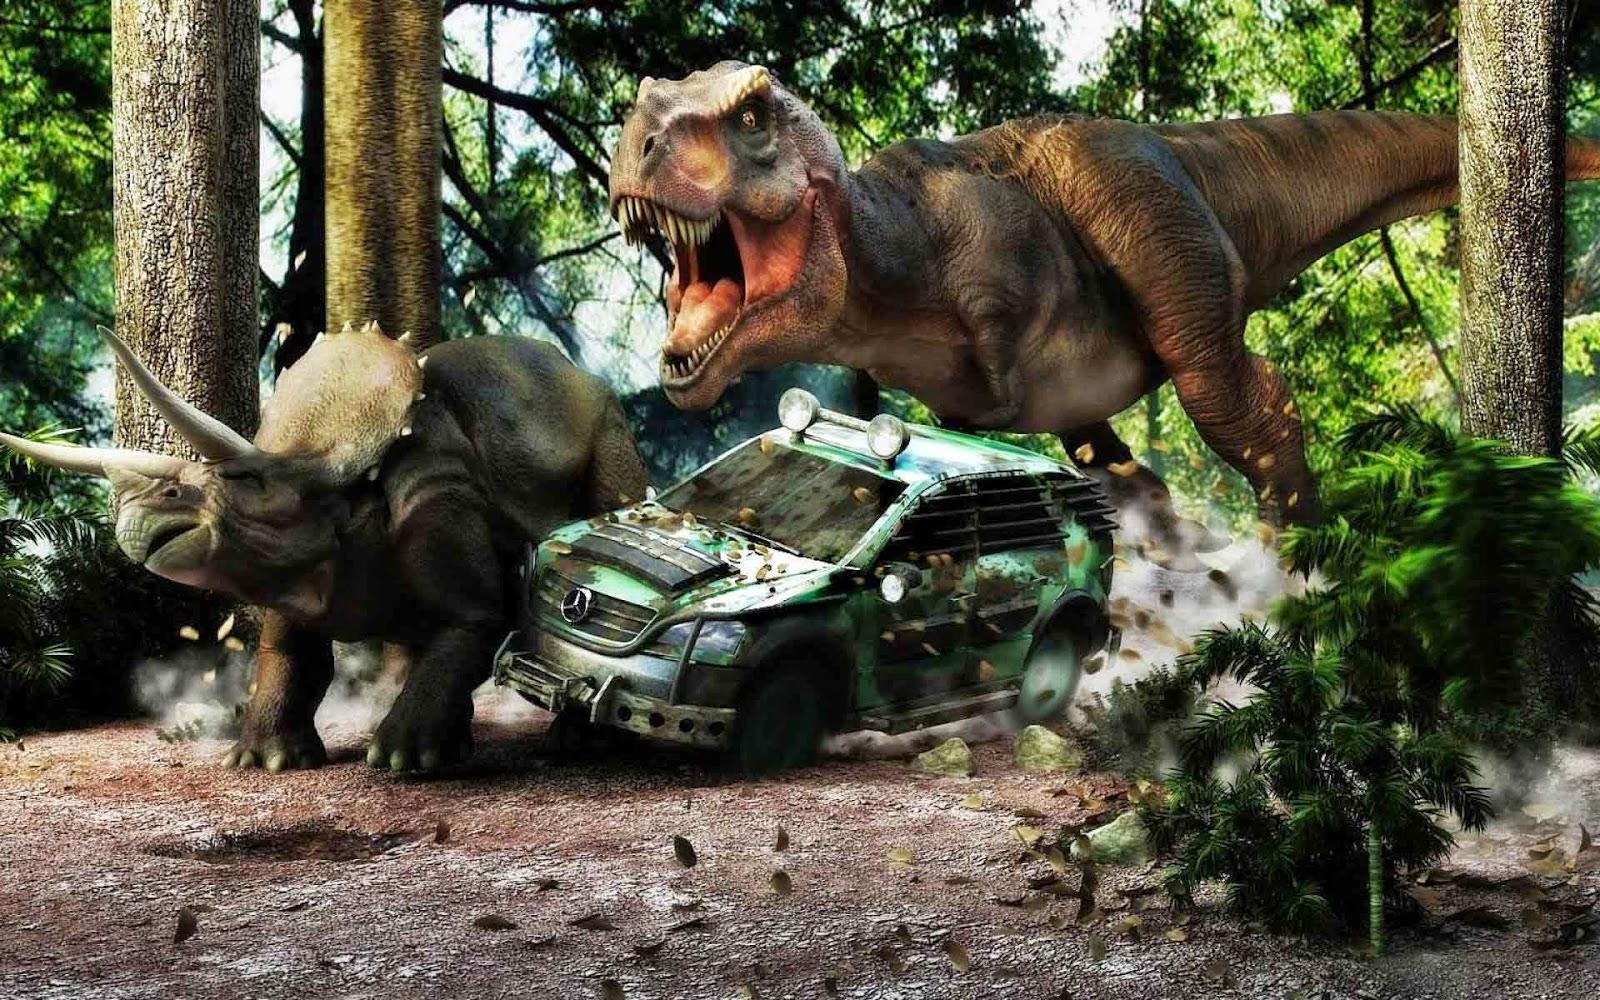 Download film Jurassic World (2015) BluRay 720 Subtitle Indonesia